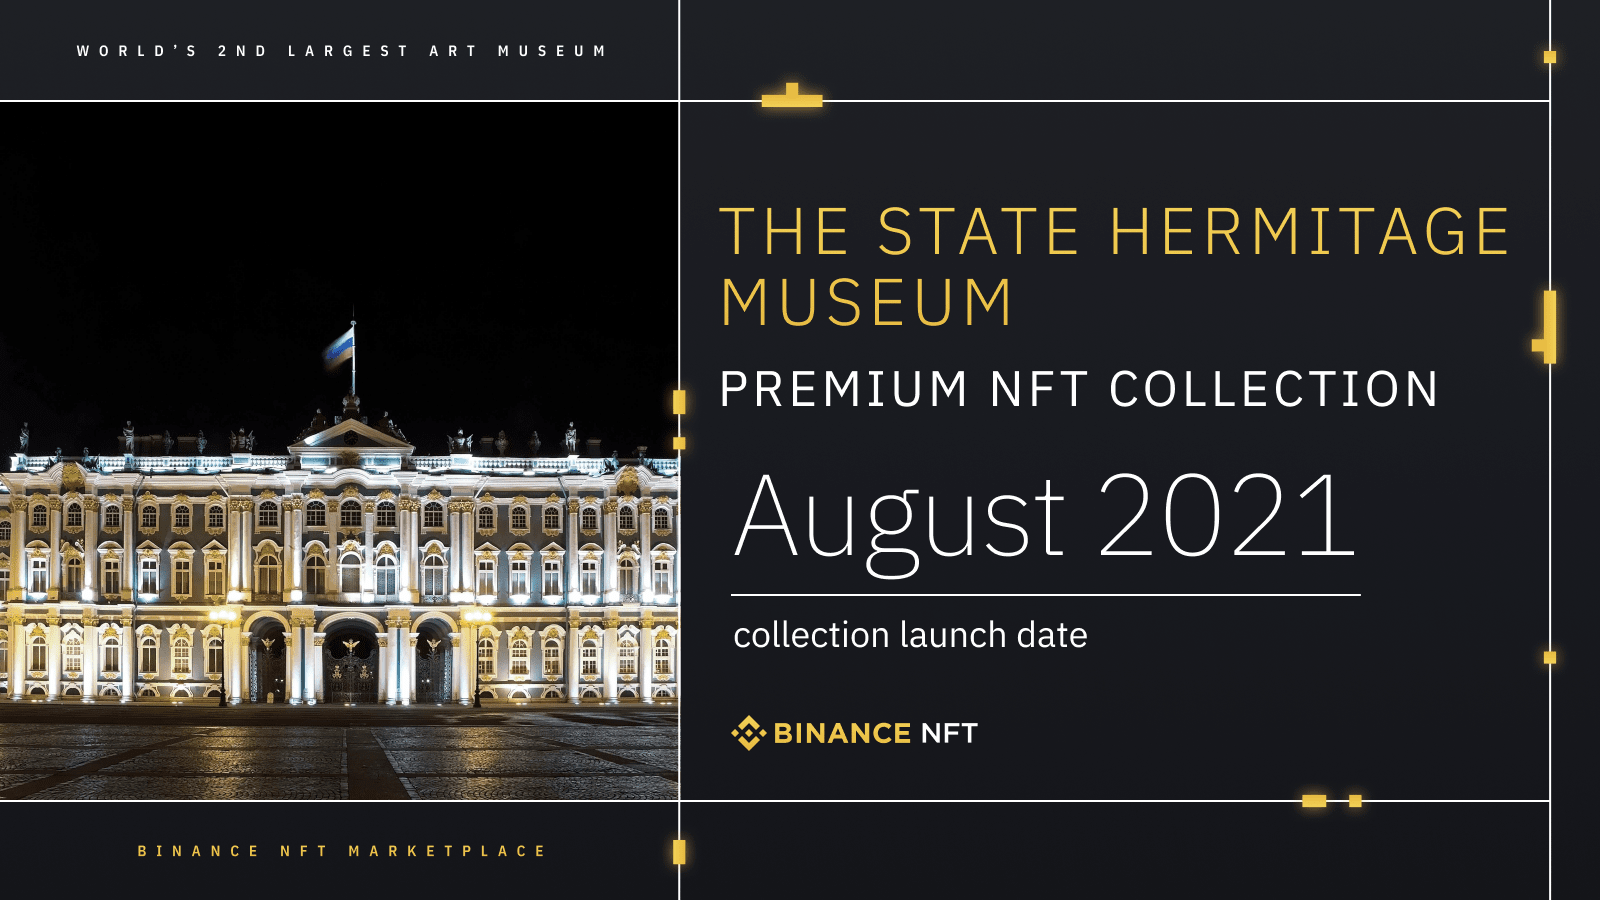 Binance NFT marketplace to feature tokenized art, including Leonardo da Vinci, from The State Hermitage Museum